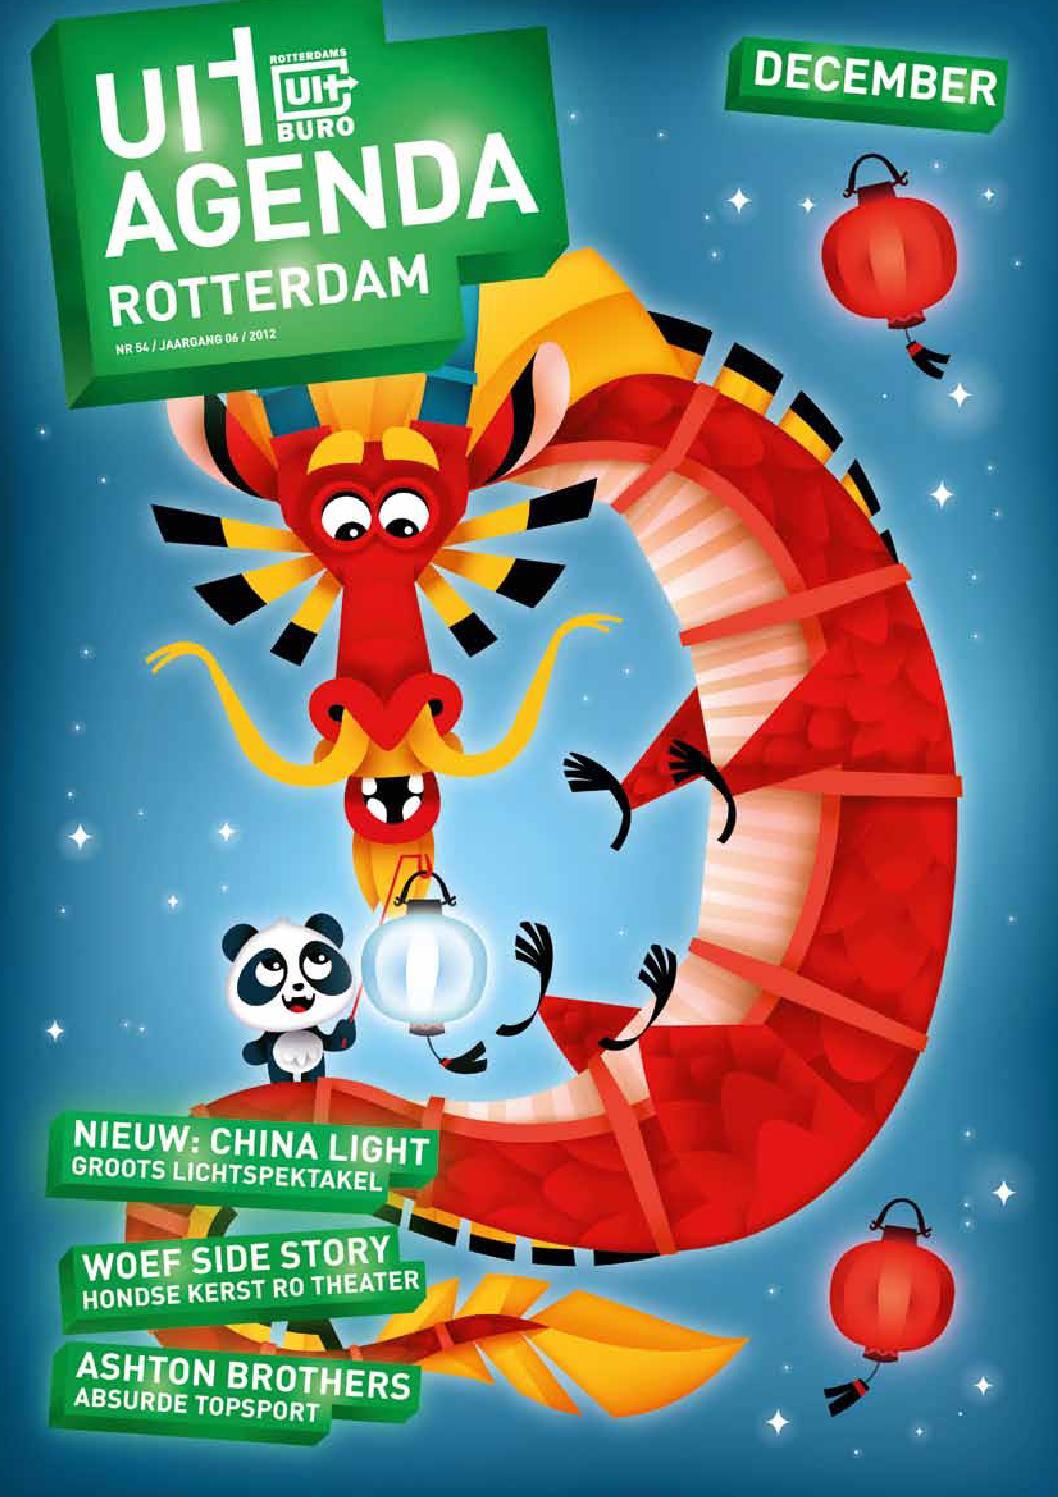 Uitagenda rotterdam december 2012 by rotterdam festivals for Uit agenda rotterdam